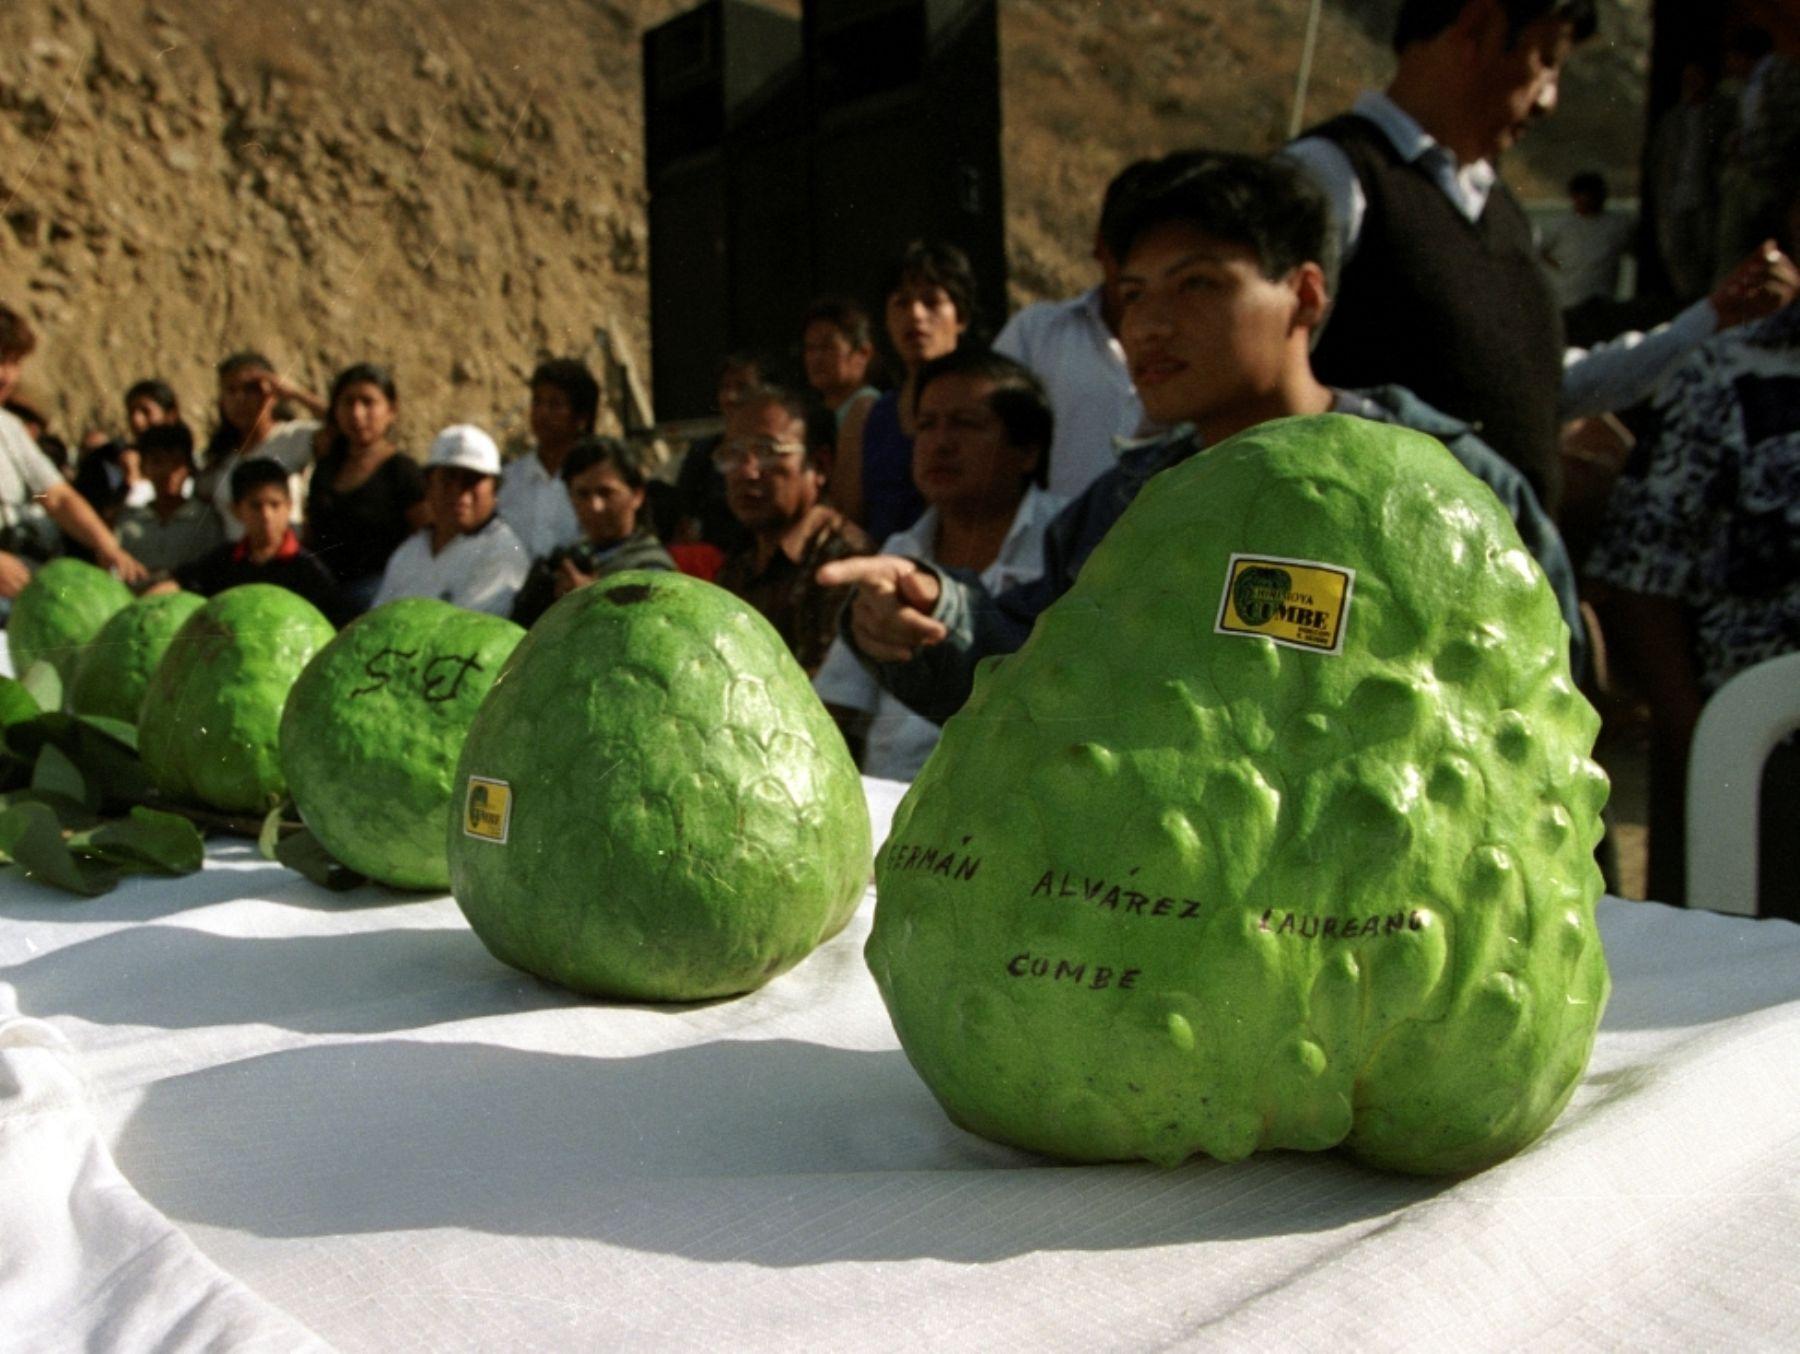 Países europeos interesados en chirimoya cumbe de Huarochirí | News |  ANDINA - Peru News Agency